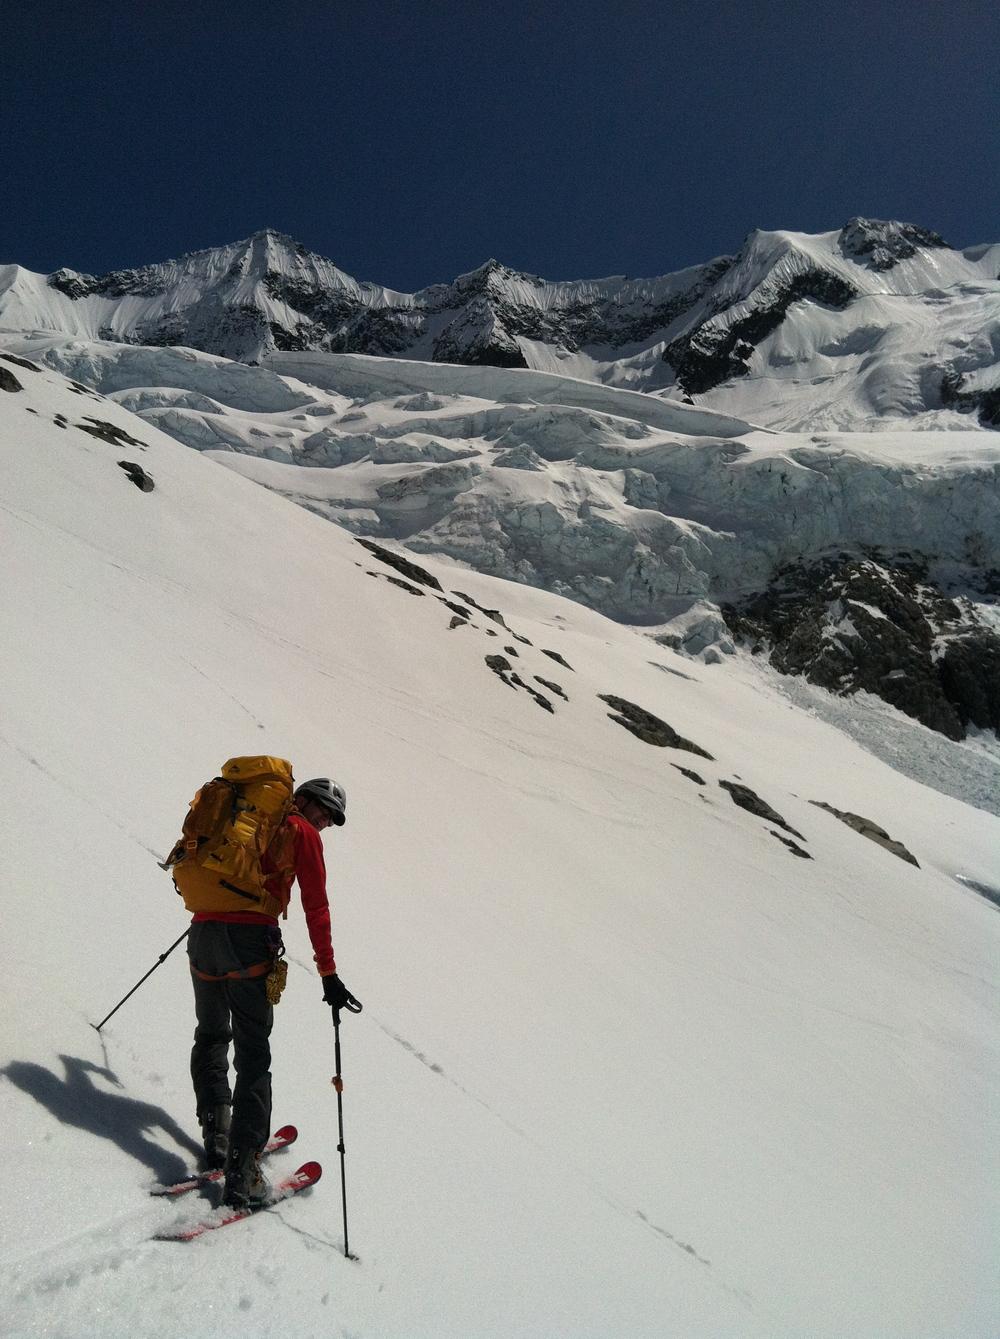 Video: Skiing the Forbidden Tour